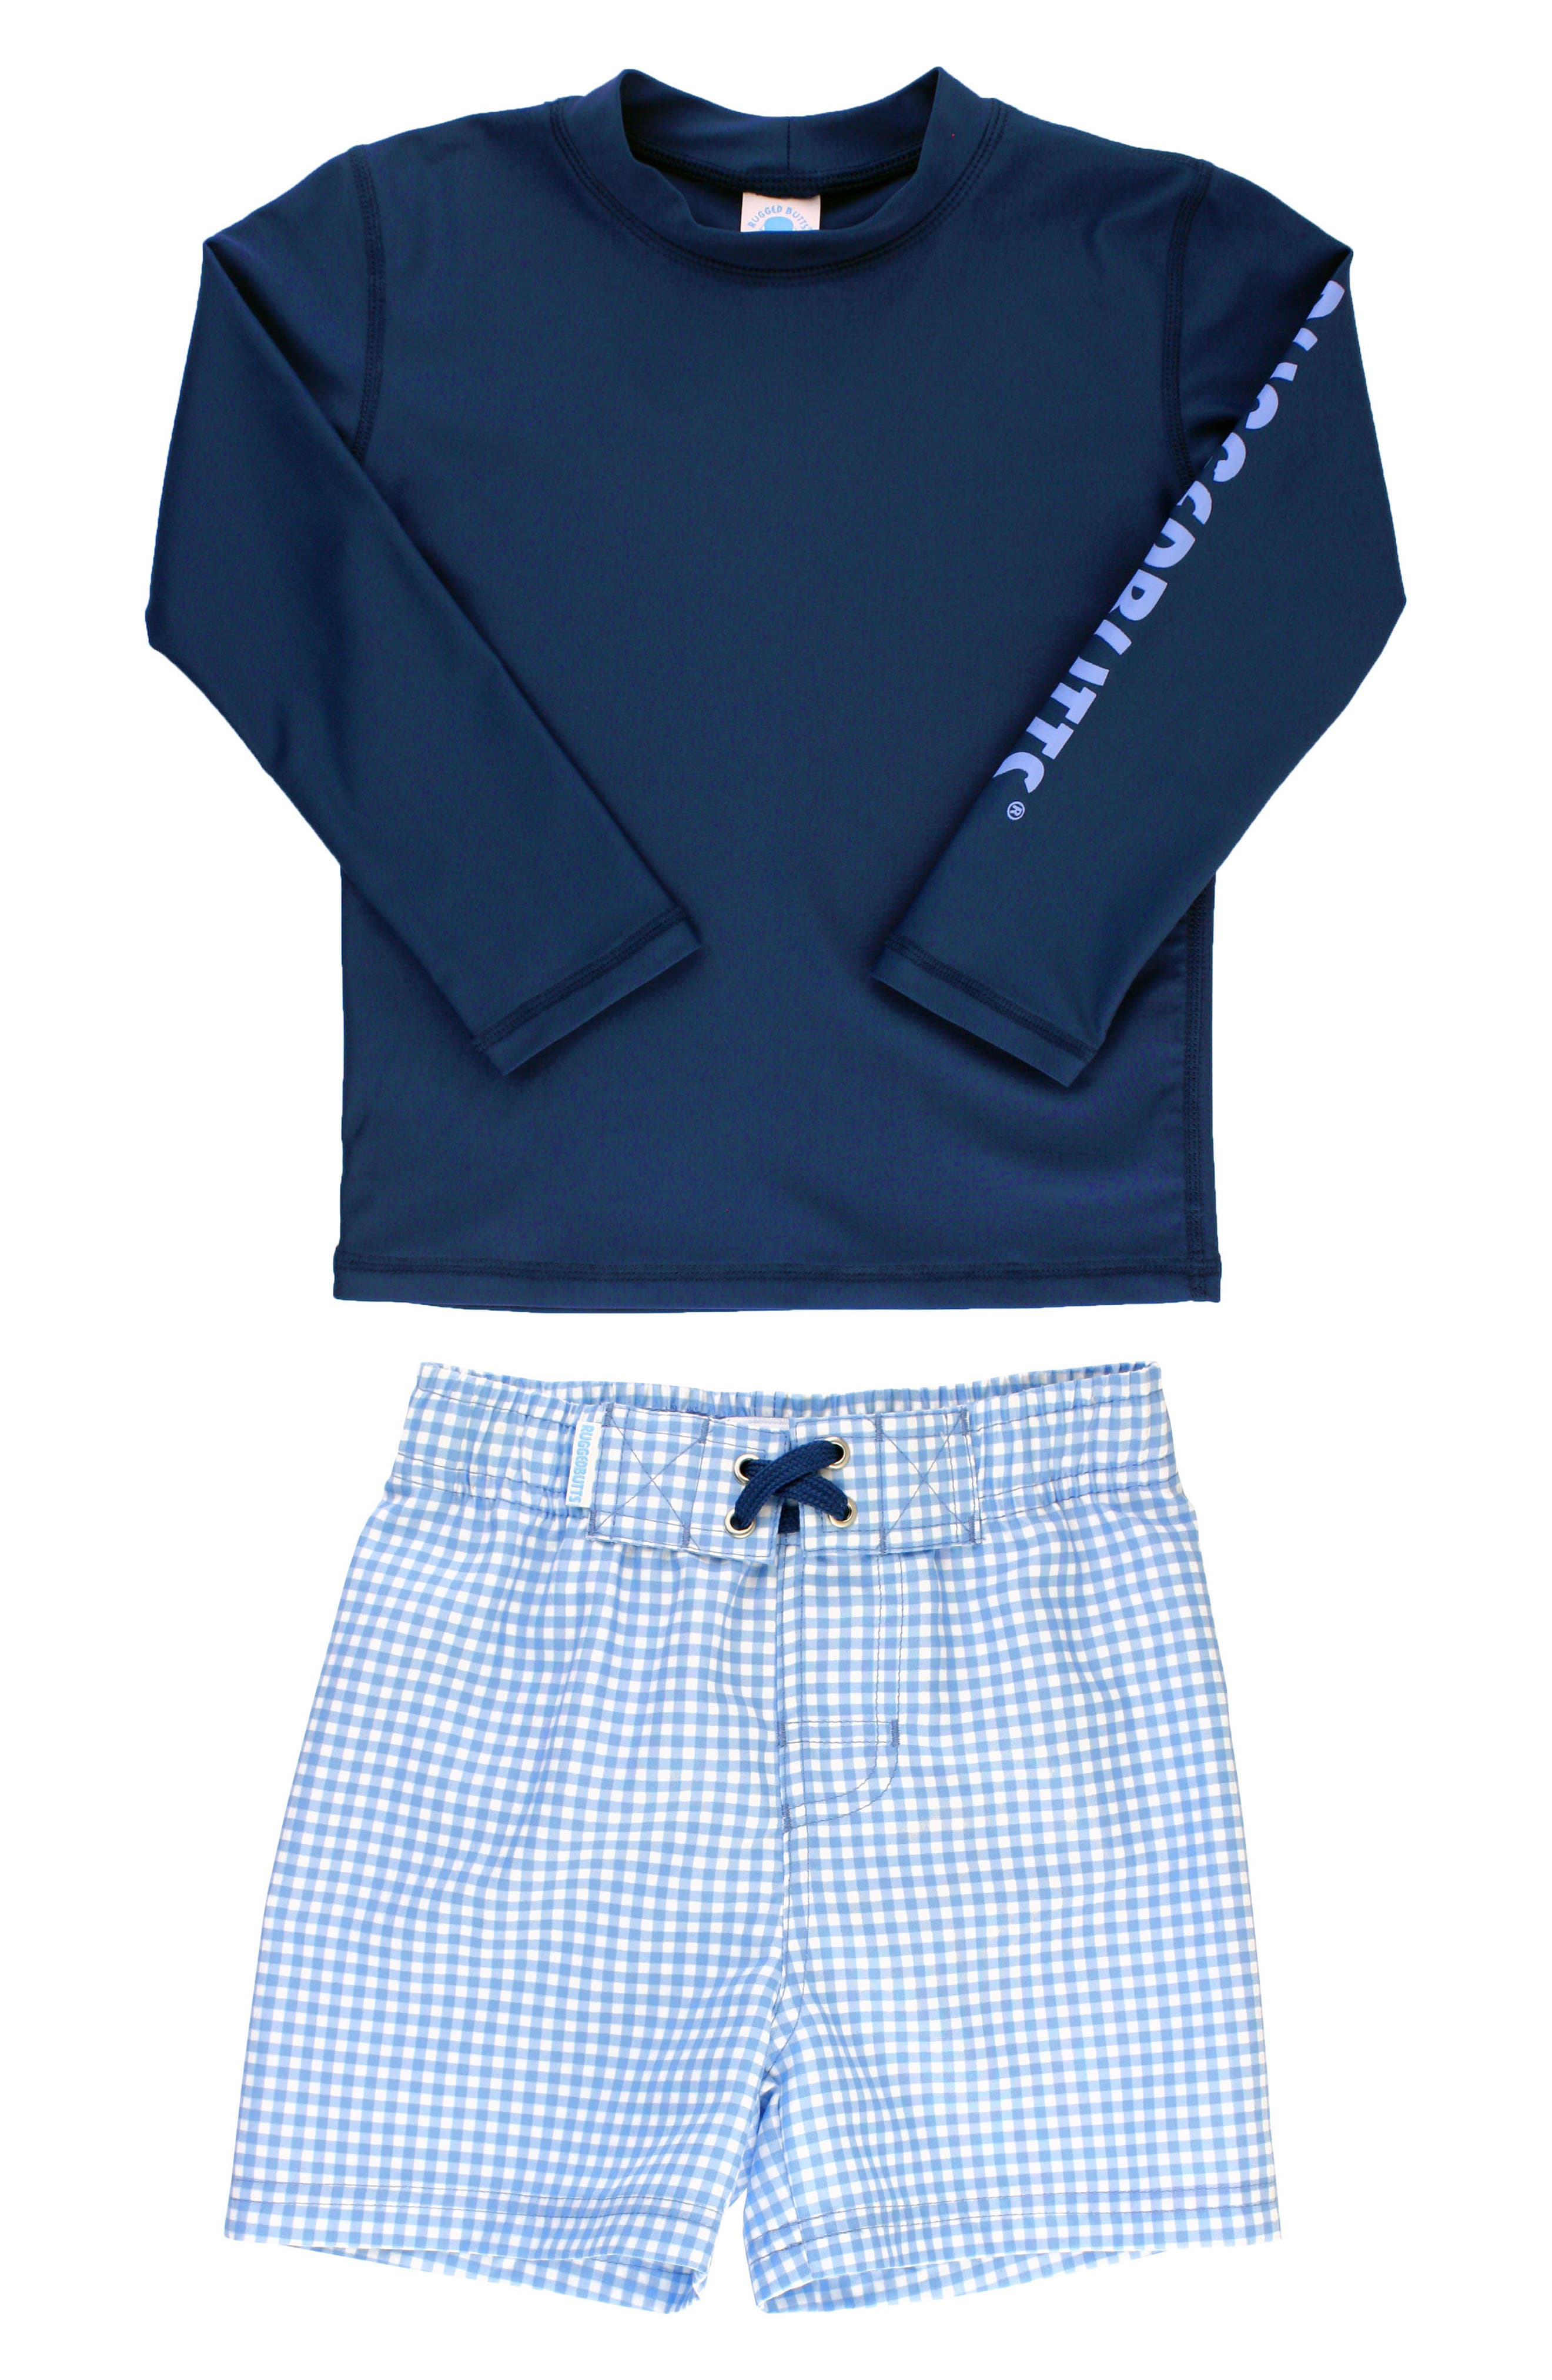 Main Image - RuggedButts Long Sleeve Rashguard & Gingham Board Shorts Set (Toddler Boys & Little Boys)